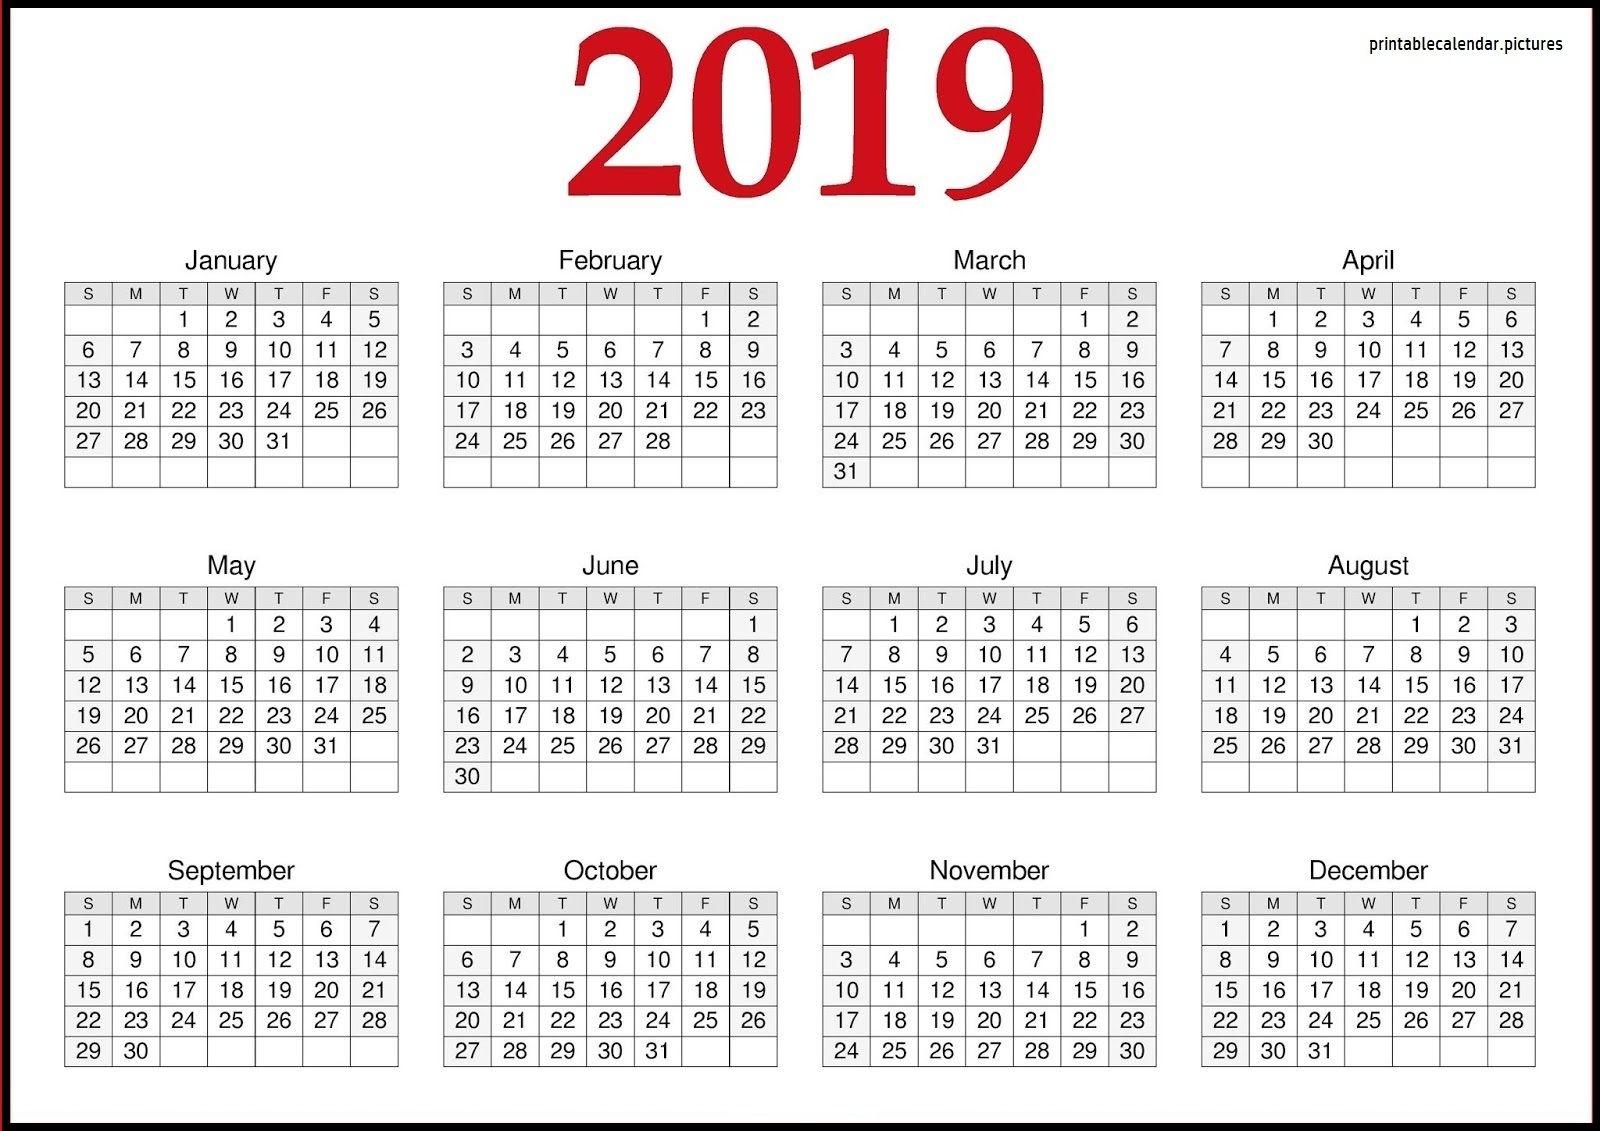 2019 Calendar Printable Word, Excel, Pdf, And Template  </p>   </div>        <br>     <div class=